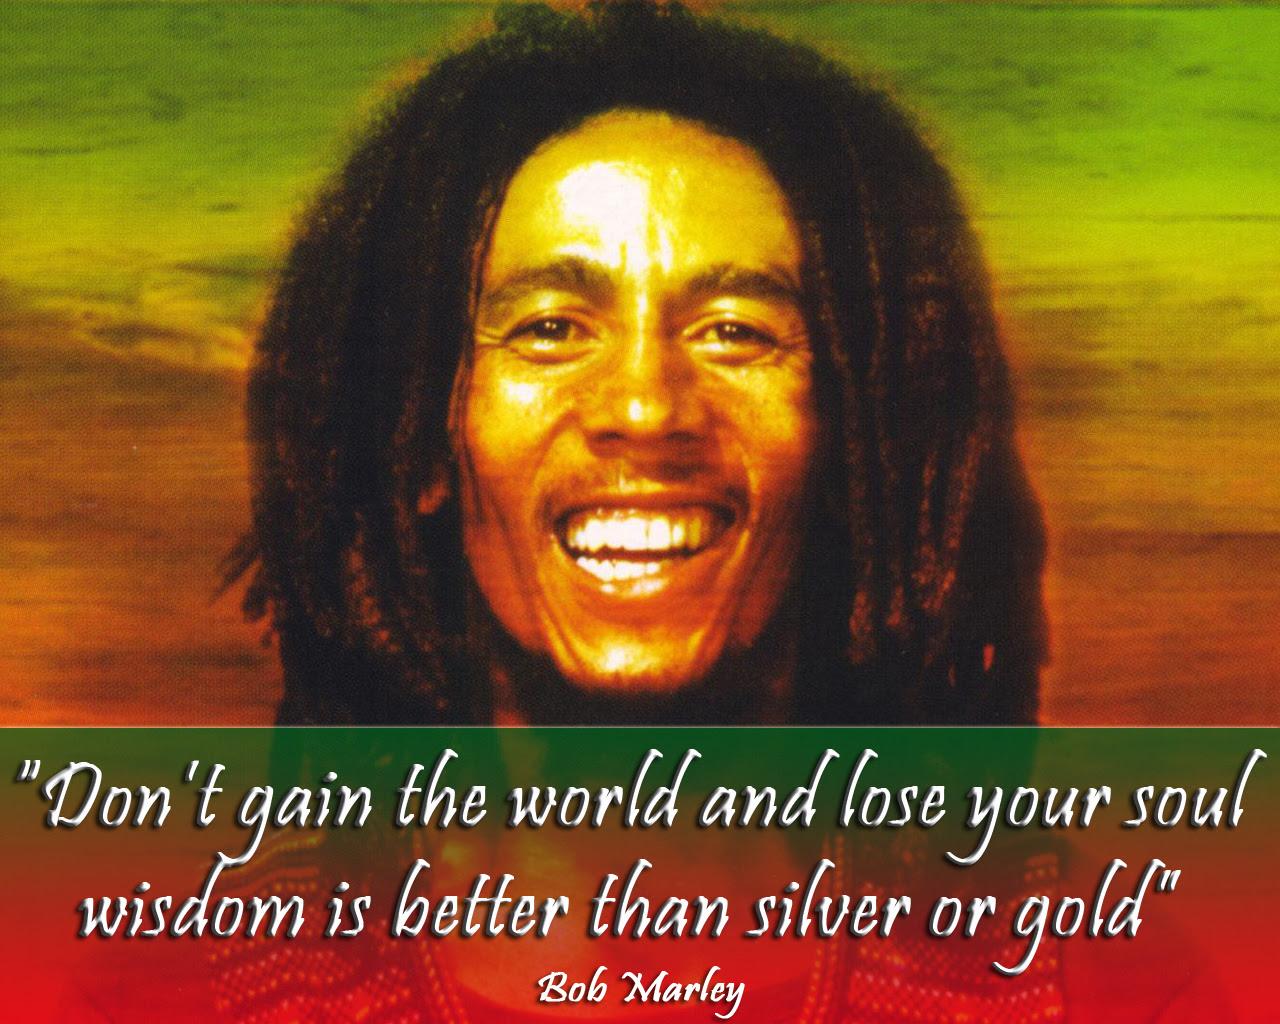 Bob Marley Quotes. QuotesGram